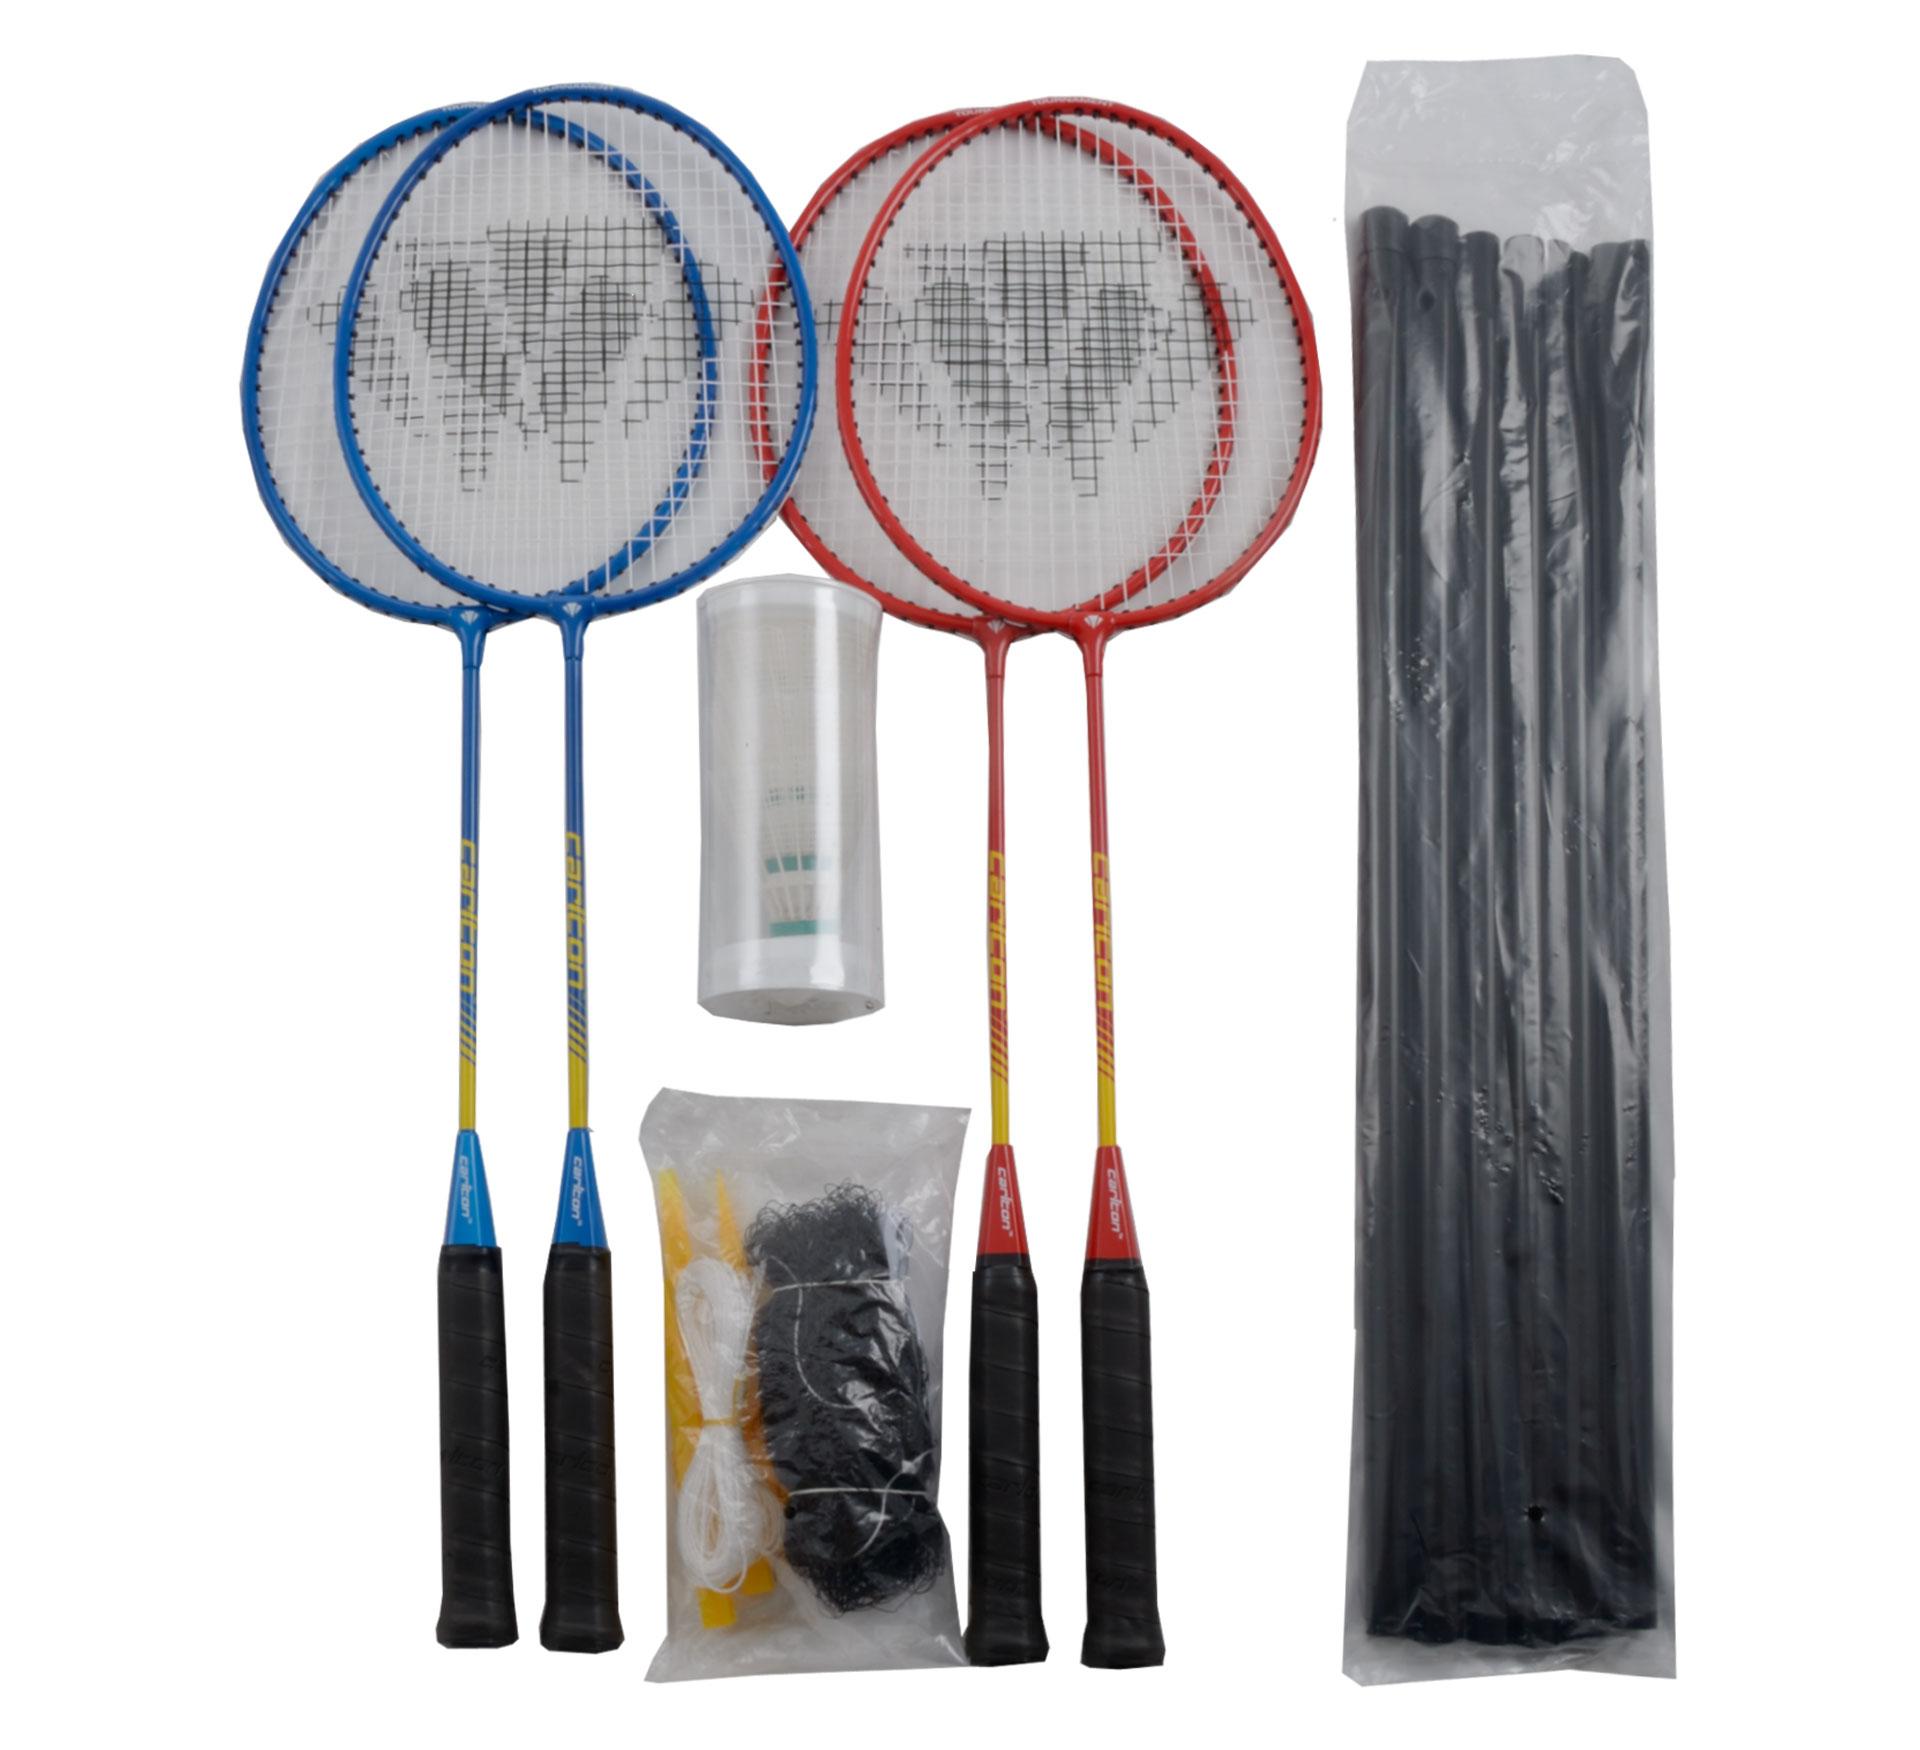 Carlton Badminton Carlton Pour un tournoi de 4 joueurs